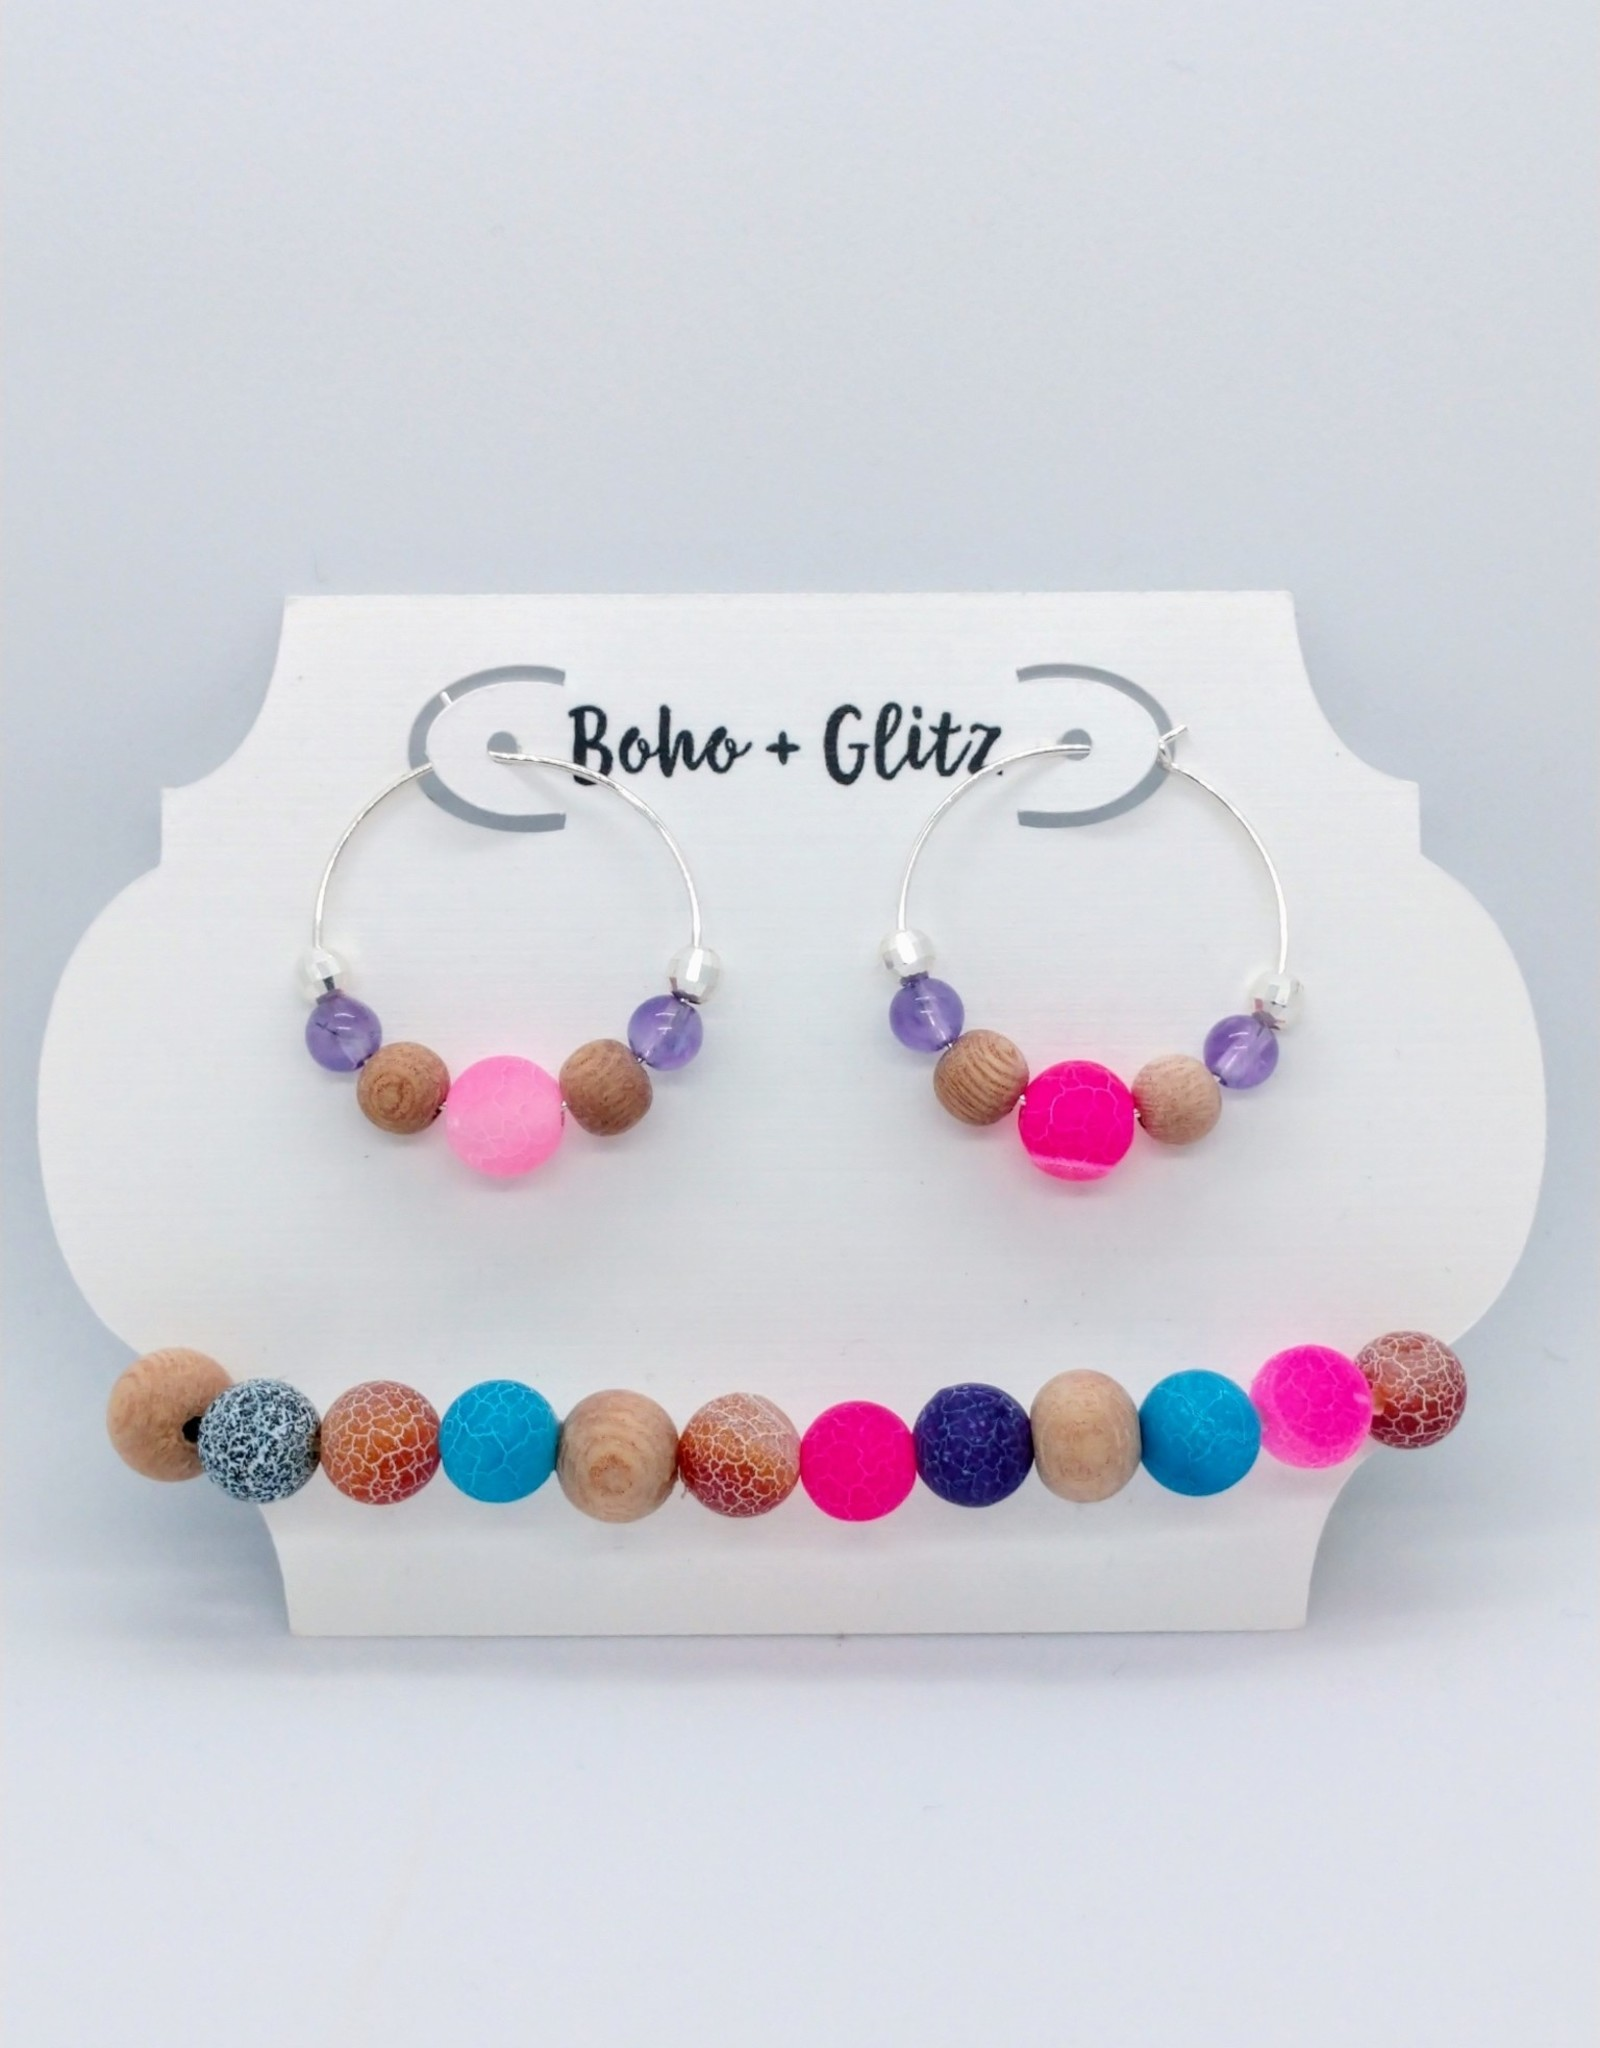 Boho & Glitz Boho & Glitz - Earring and Bracelet Combo ID2